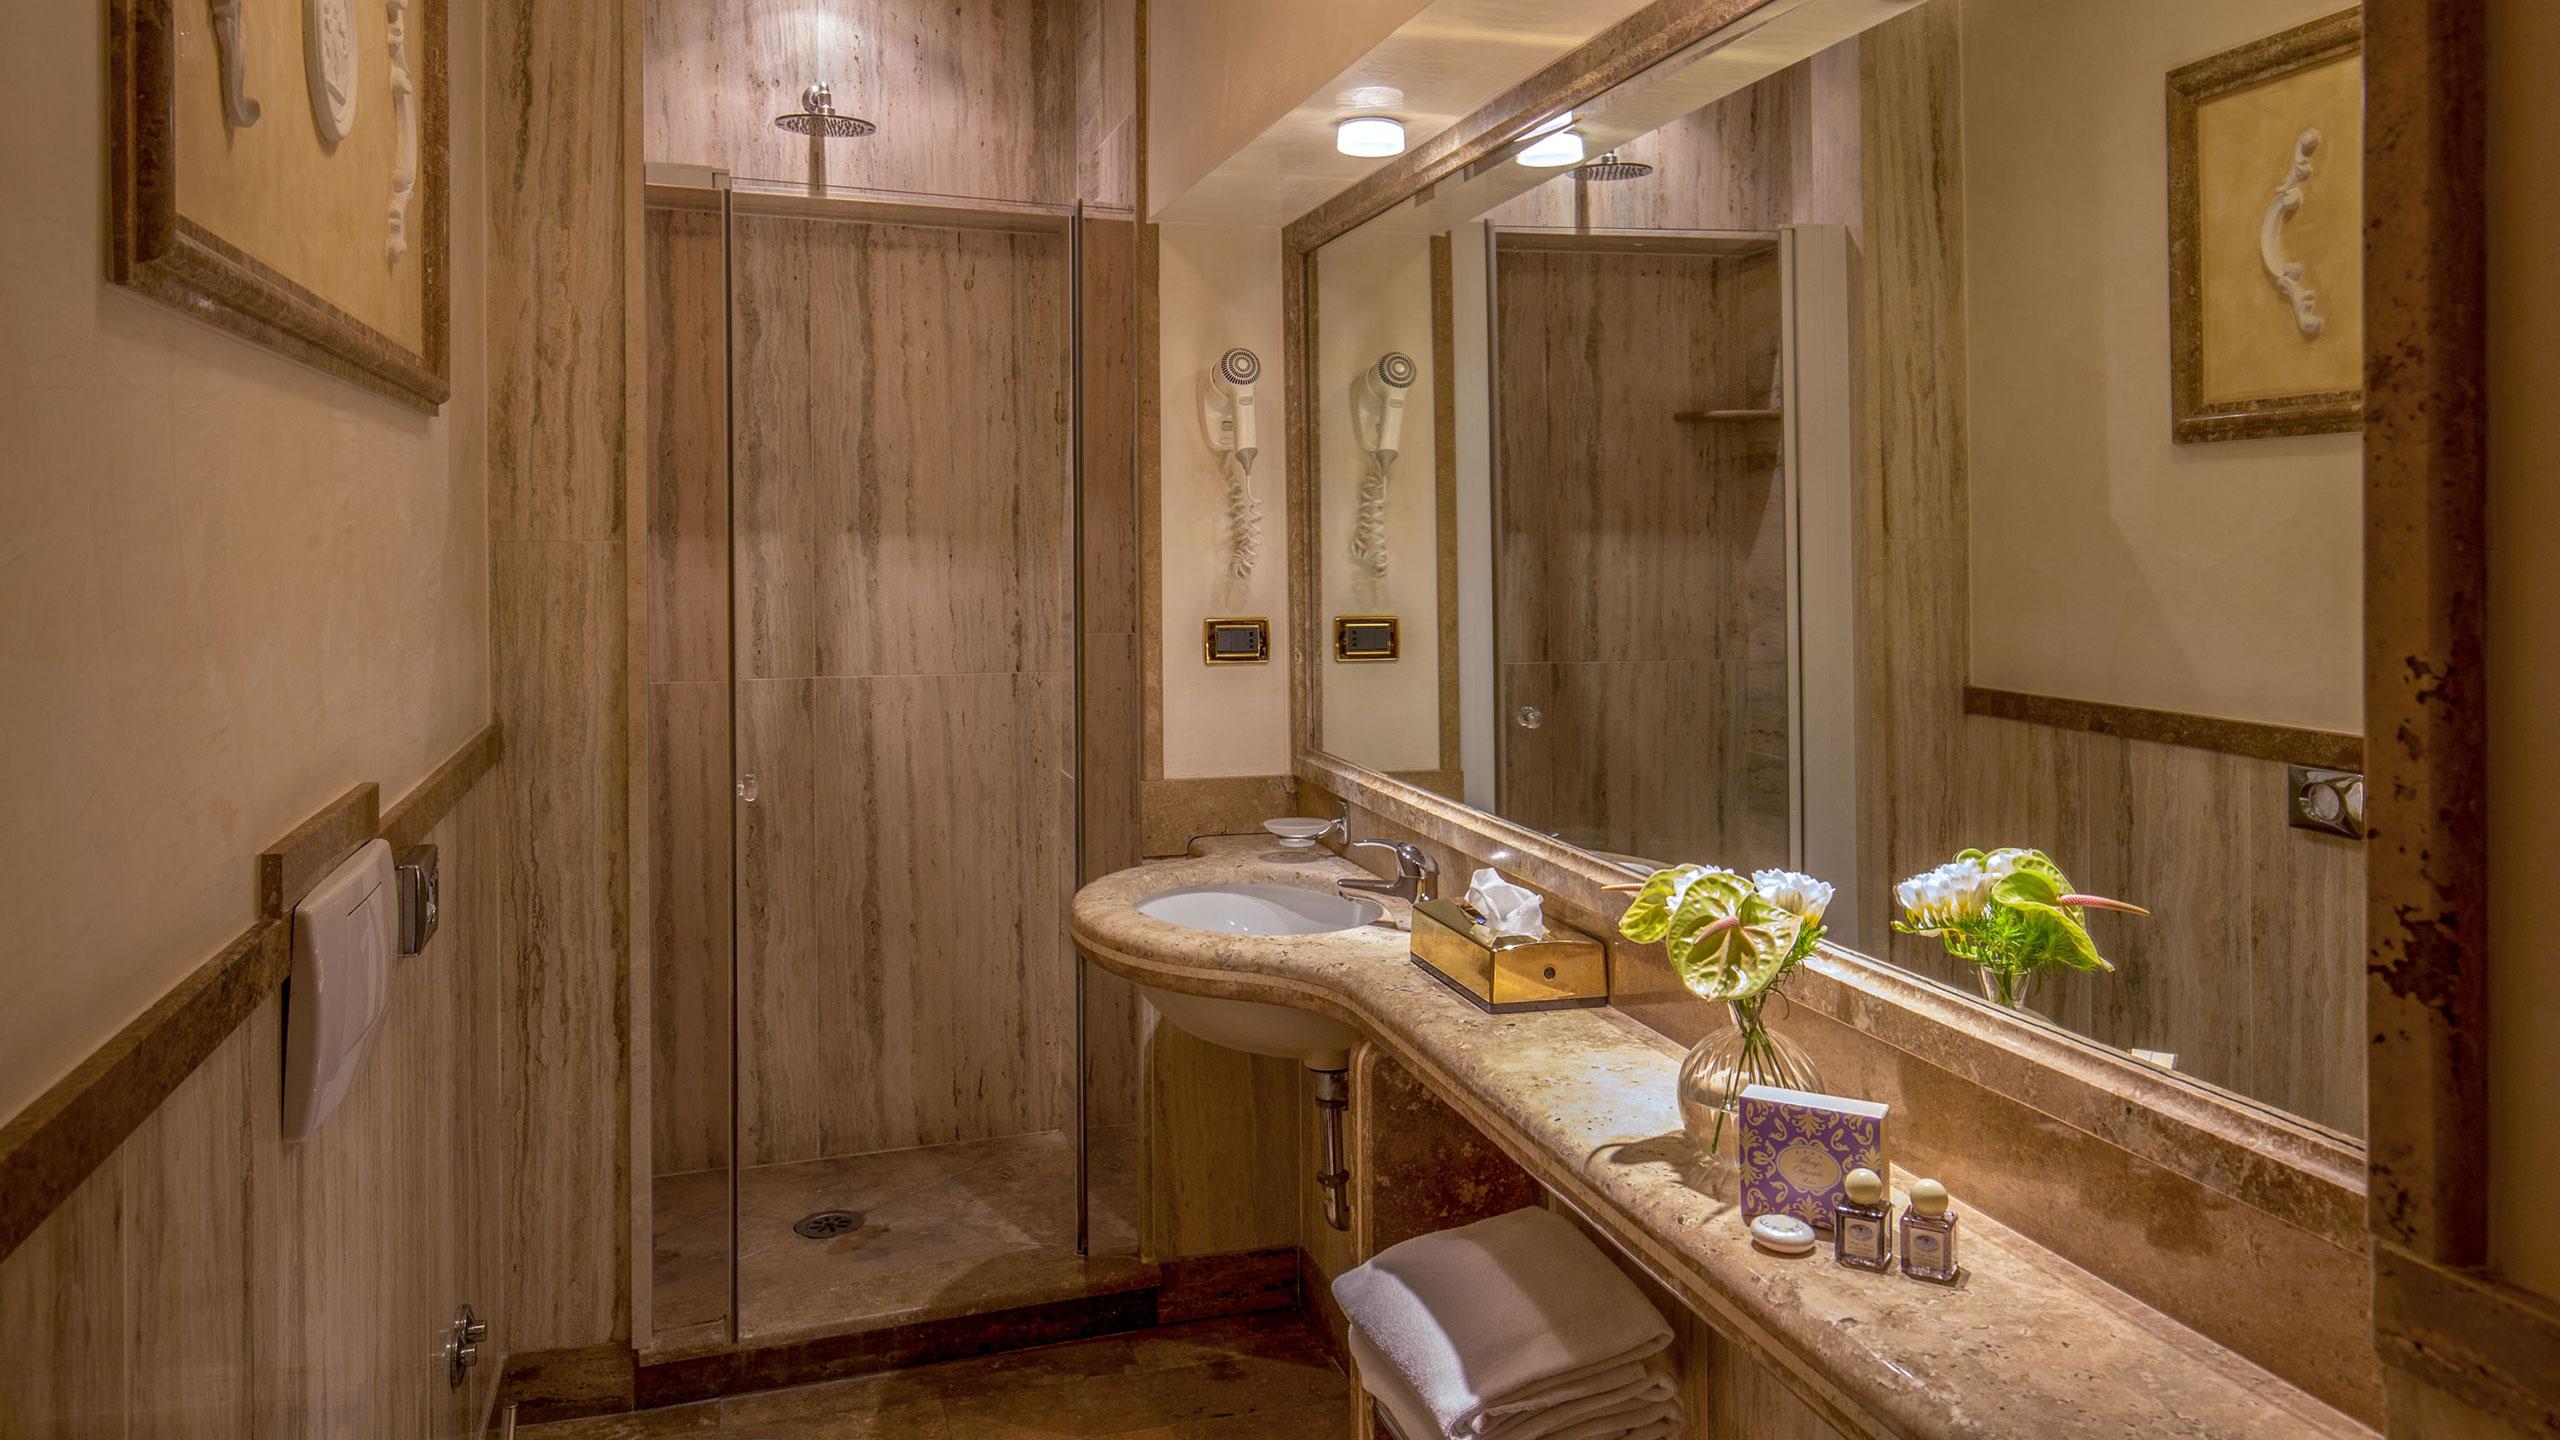 albergo-ottocento-rome-bathroom-16